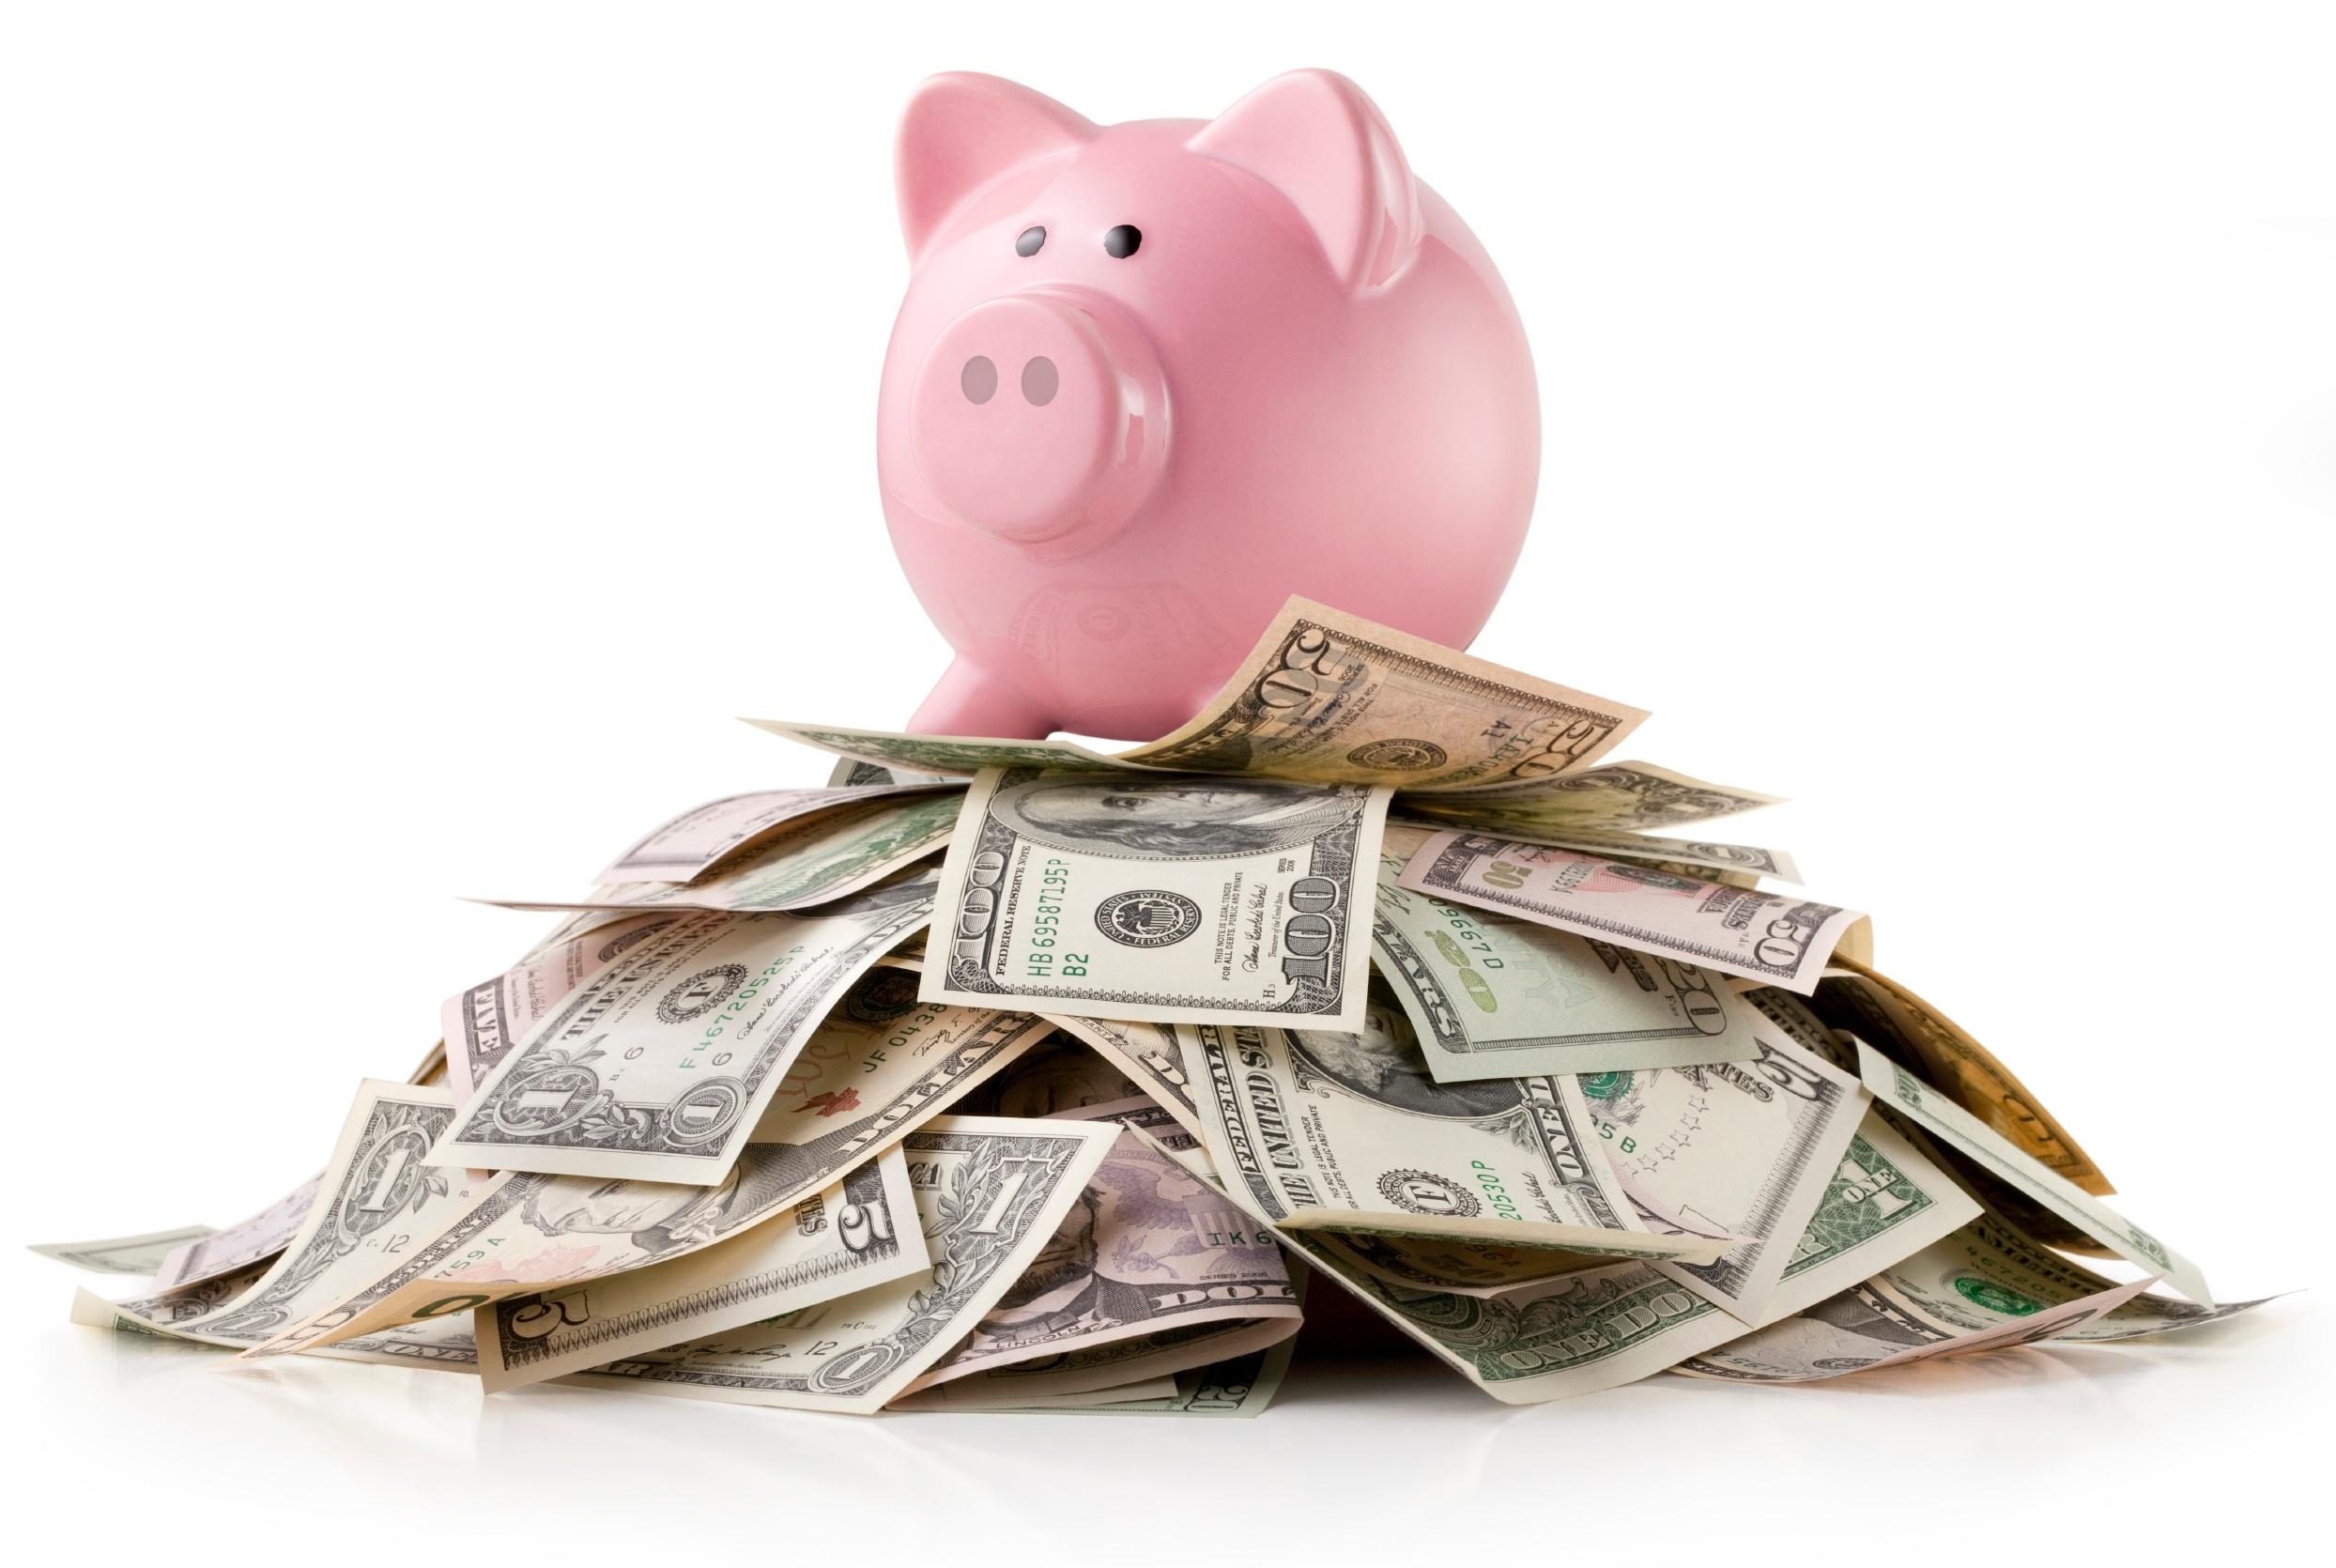 Piggy Bank Money Sales Promotional Products